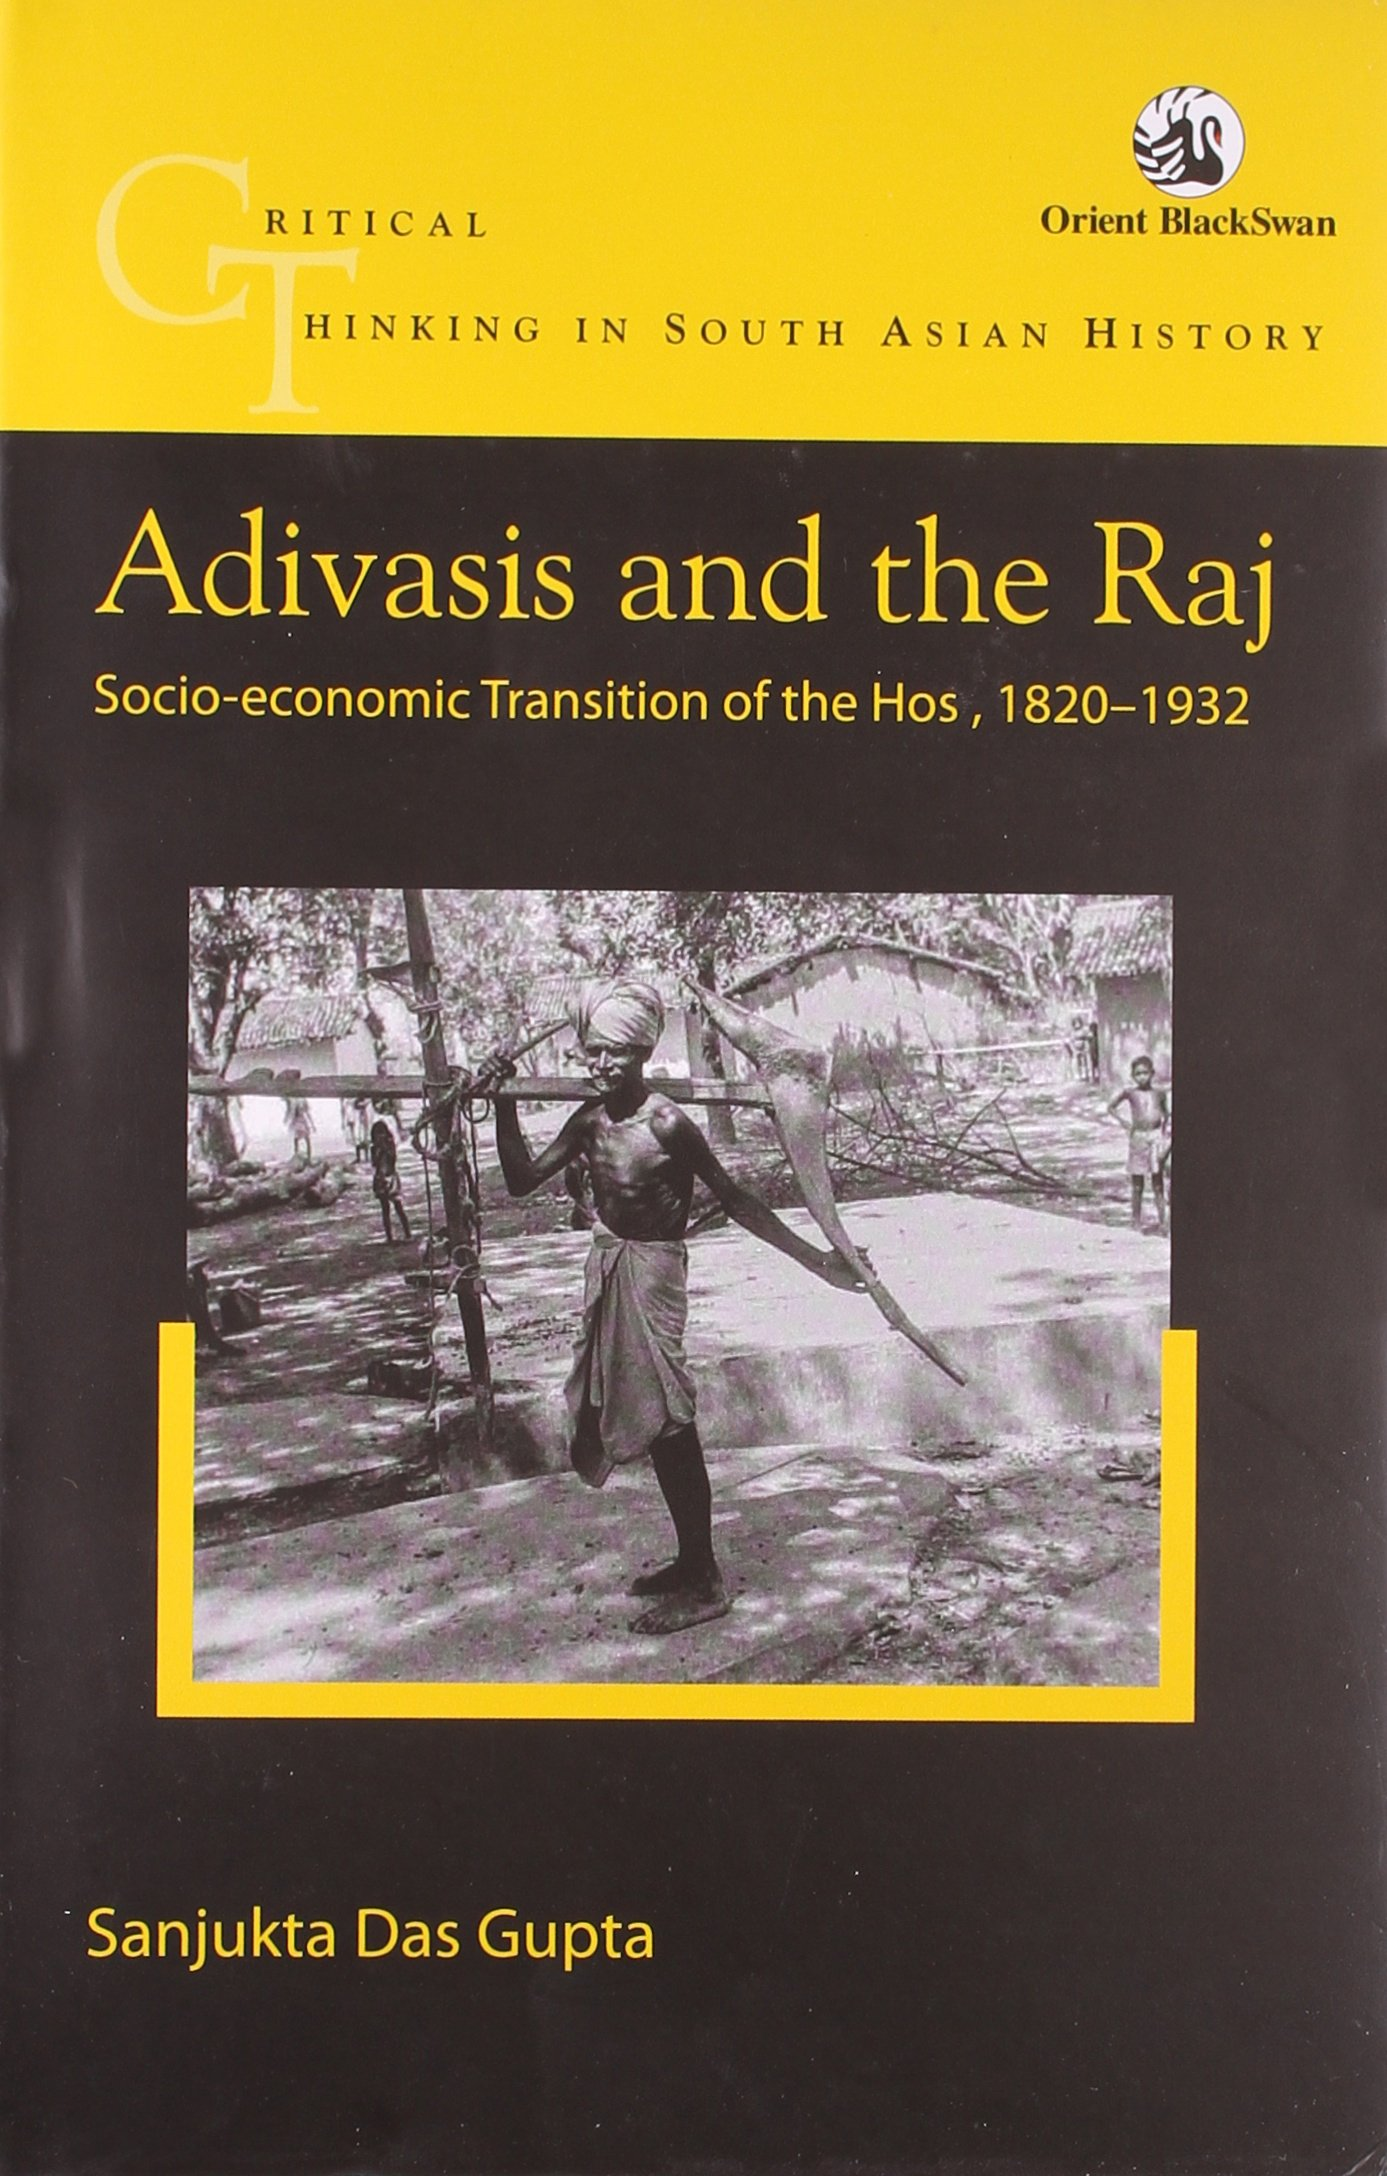 Adivasis and the Raj (Critical Thinking in South Asian History) pdf epub